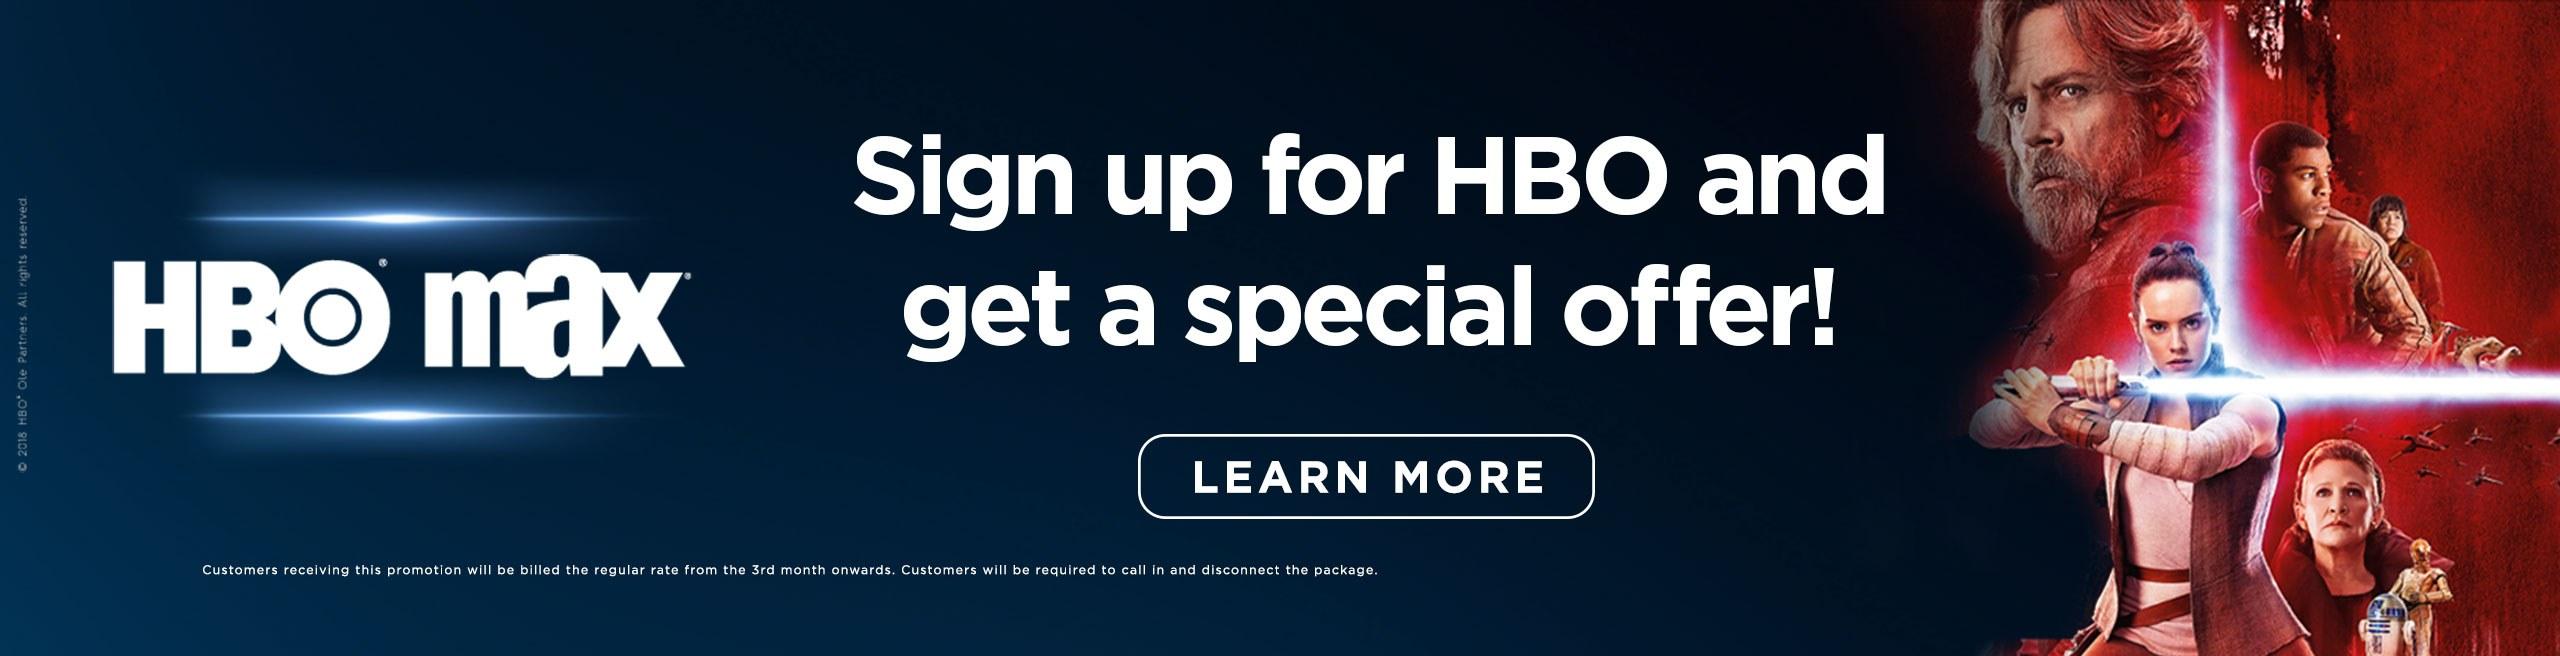 Generic-HBO-Promo-Hero-banner